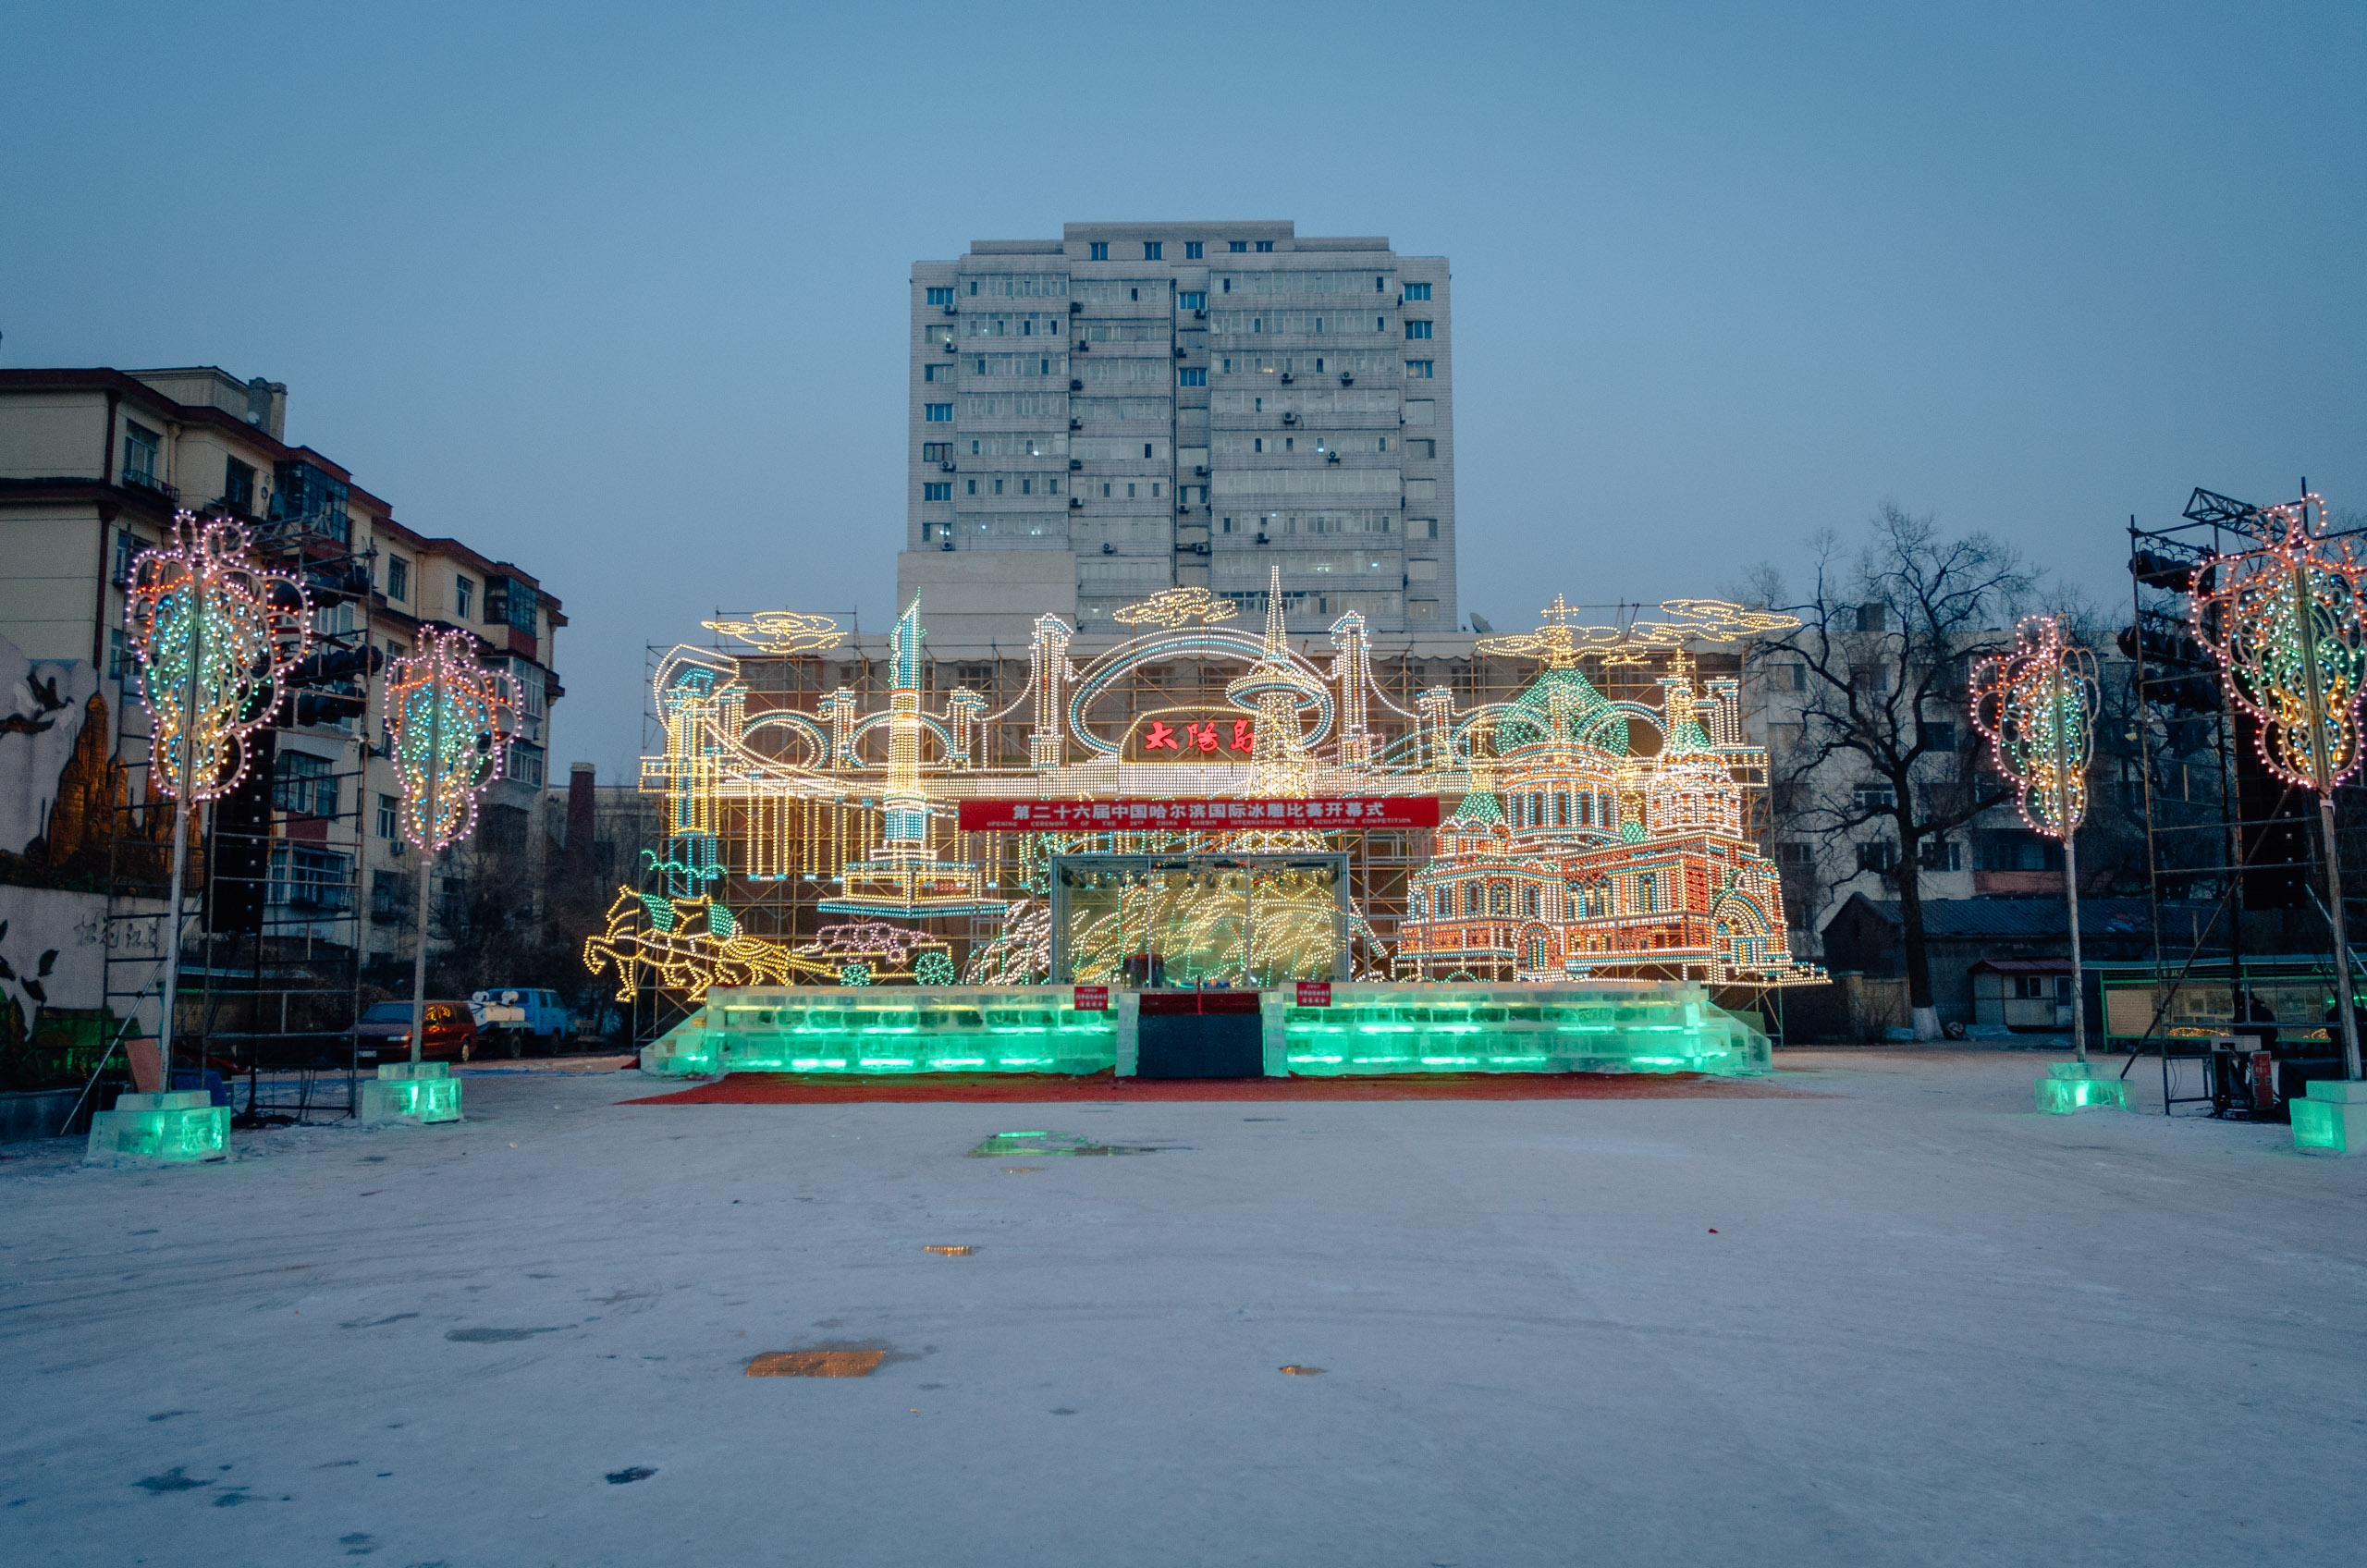 Harbin China Ice Festival - 2012-0108-DSC_1890_40445